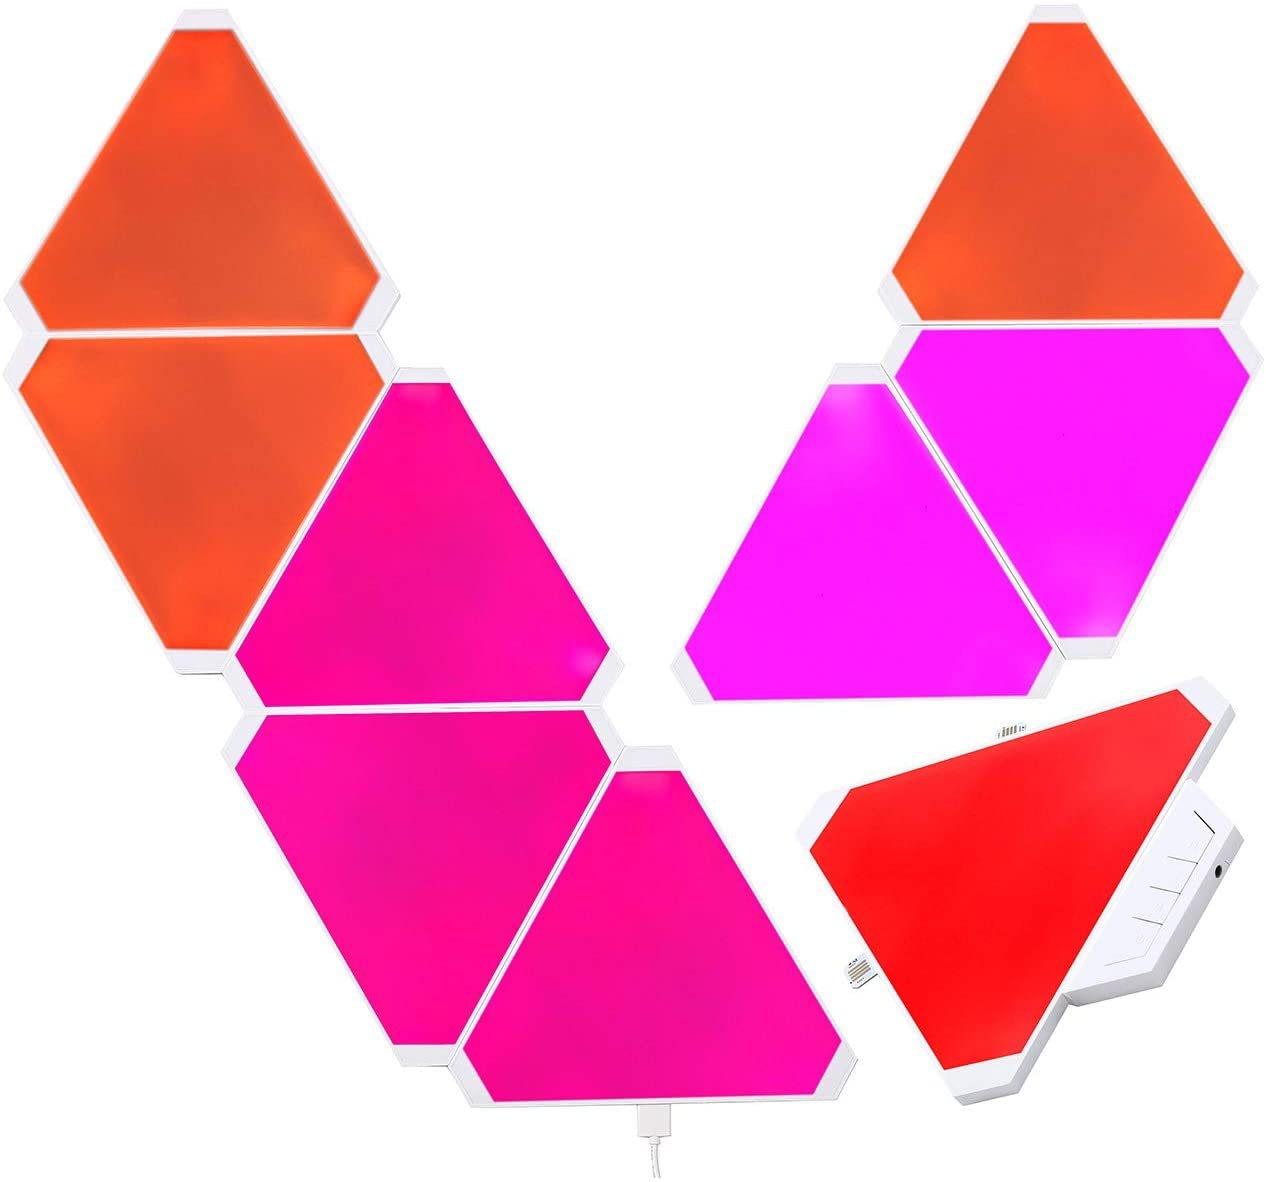 Smart Home Light Panels Rythem Edition, WiFi Smart LED Light Kit DIY Rhythm Music Syncing Smarter, Triangle Lights, Gaming Room enlarge